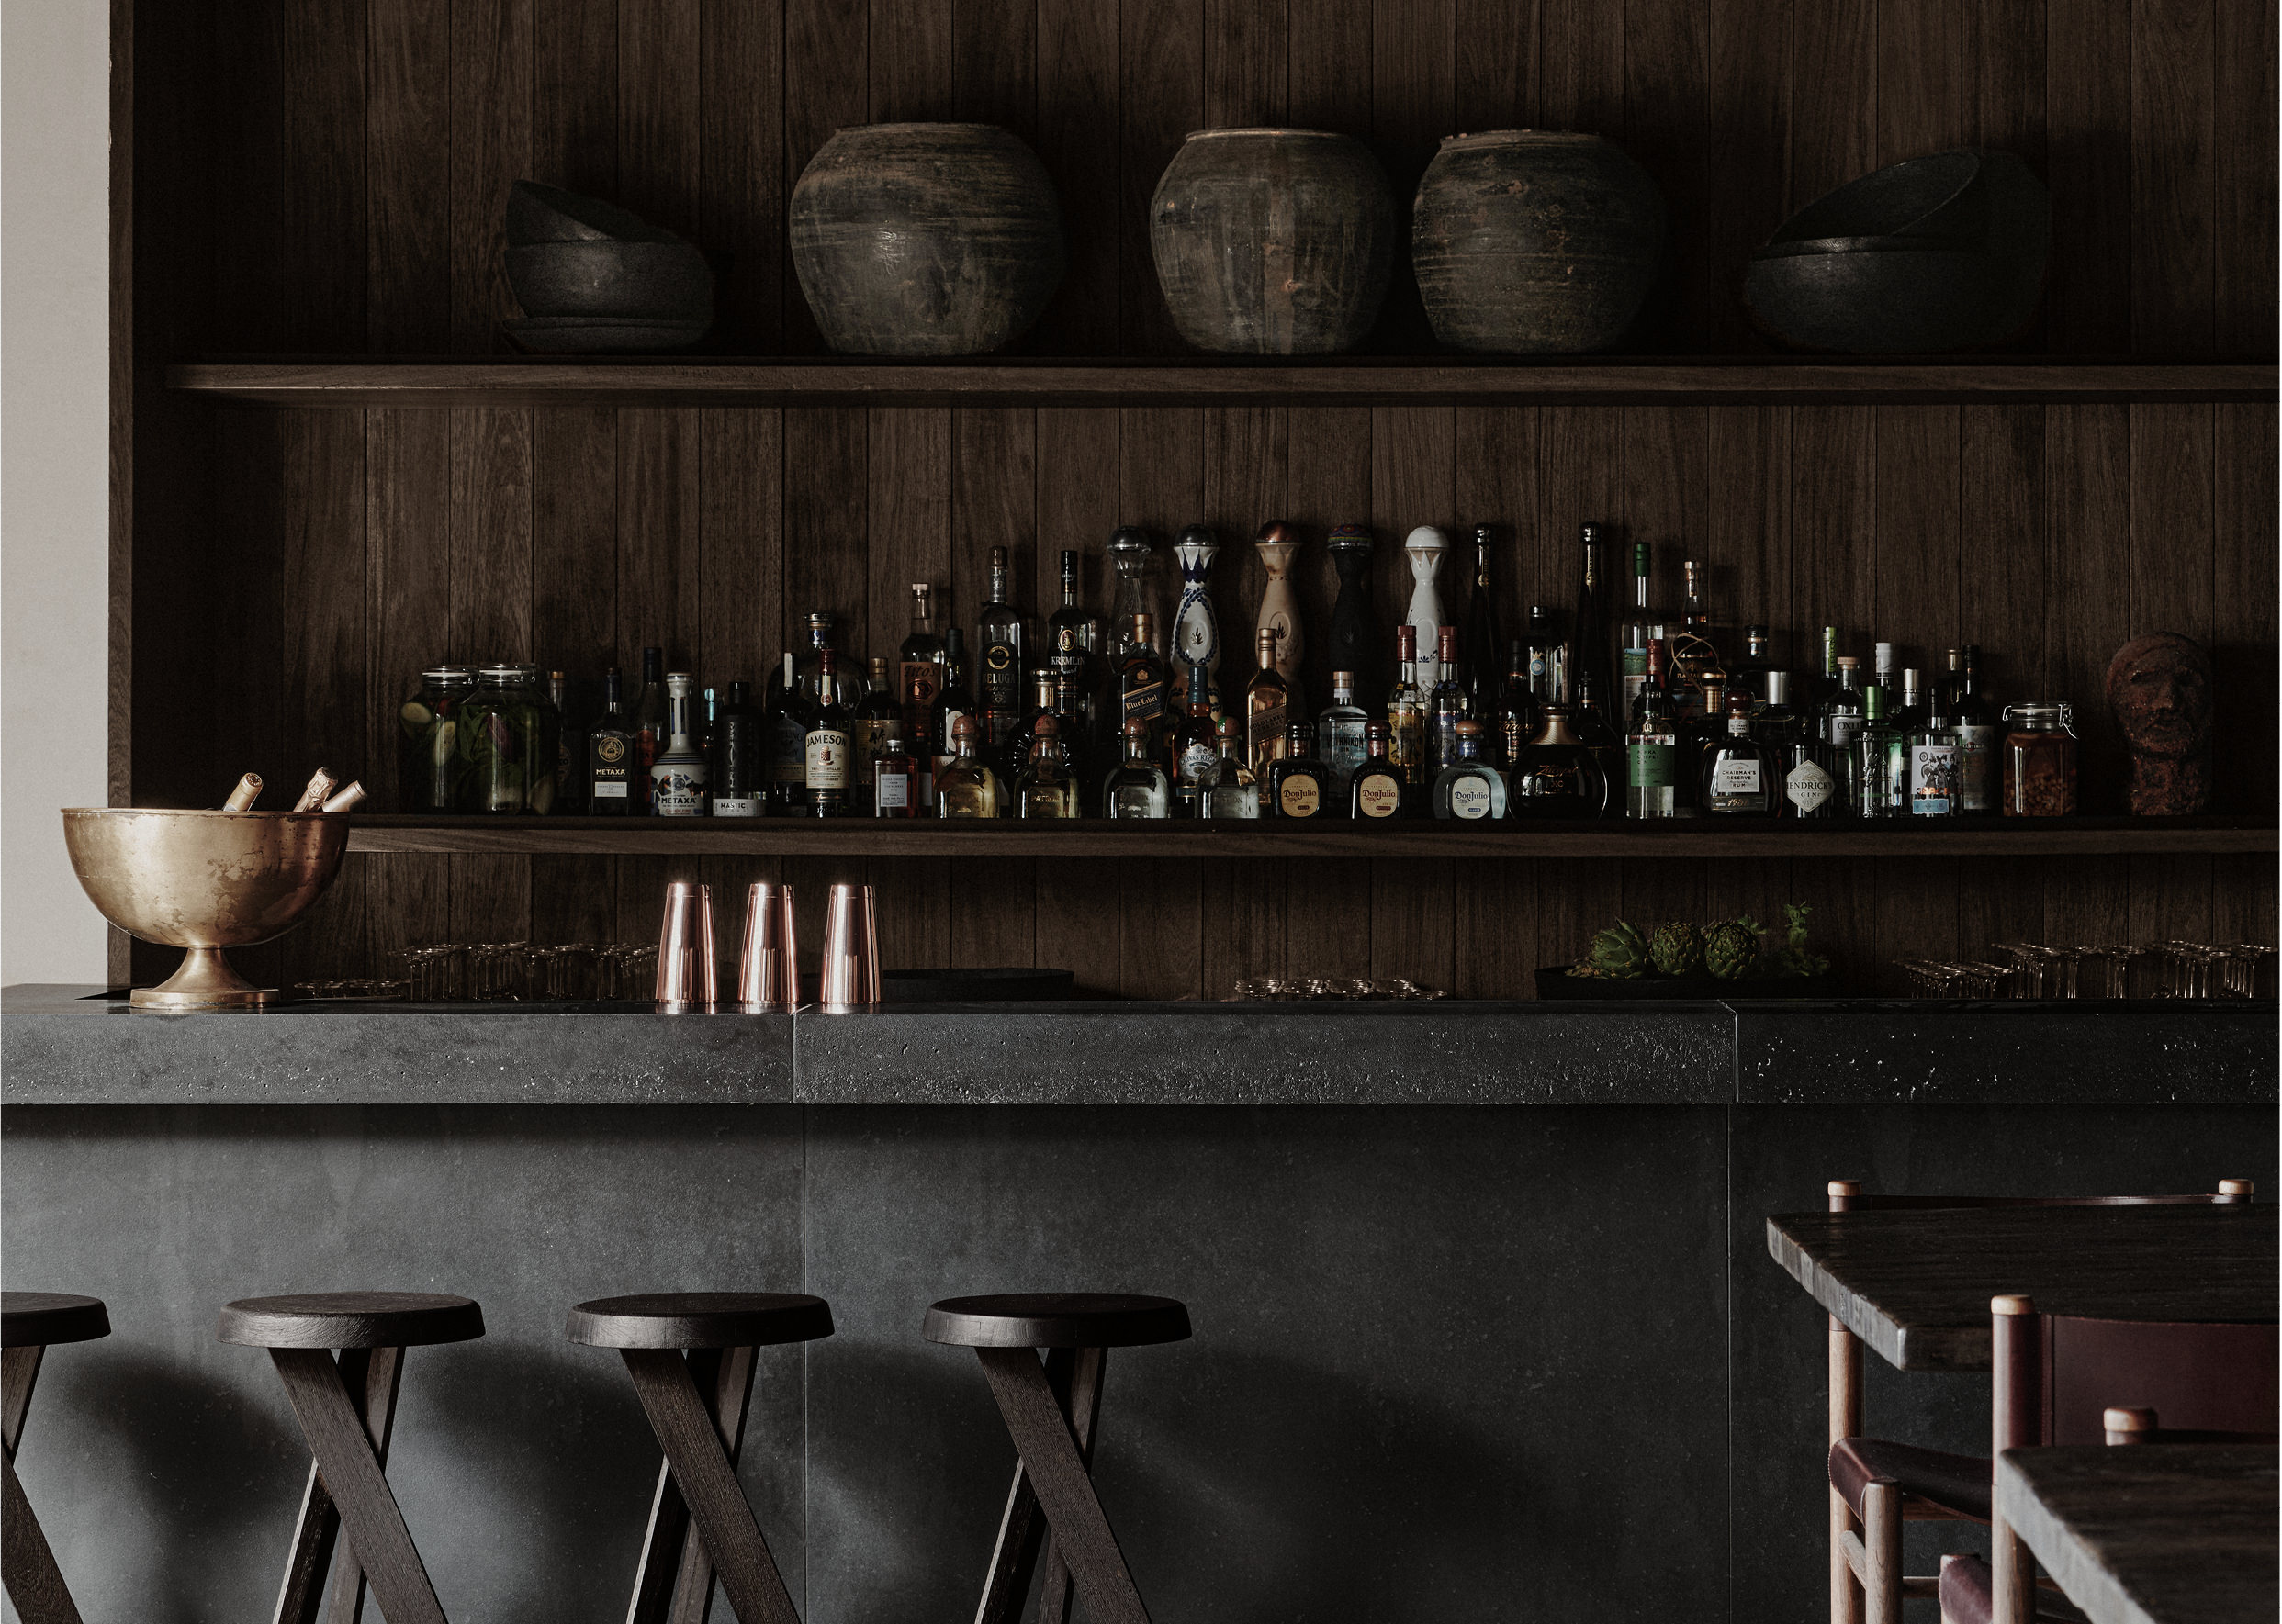 Noema Restaurant & Bar Mykonos designed by Lambs and Lions Berlin, Interior design